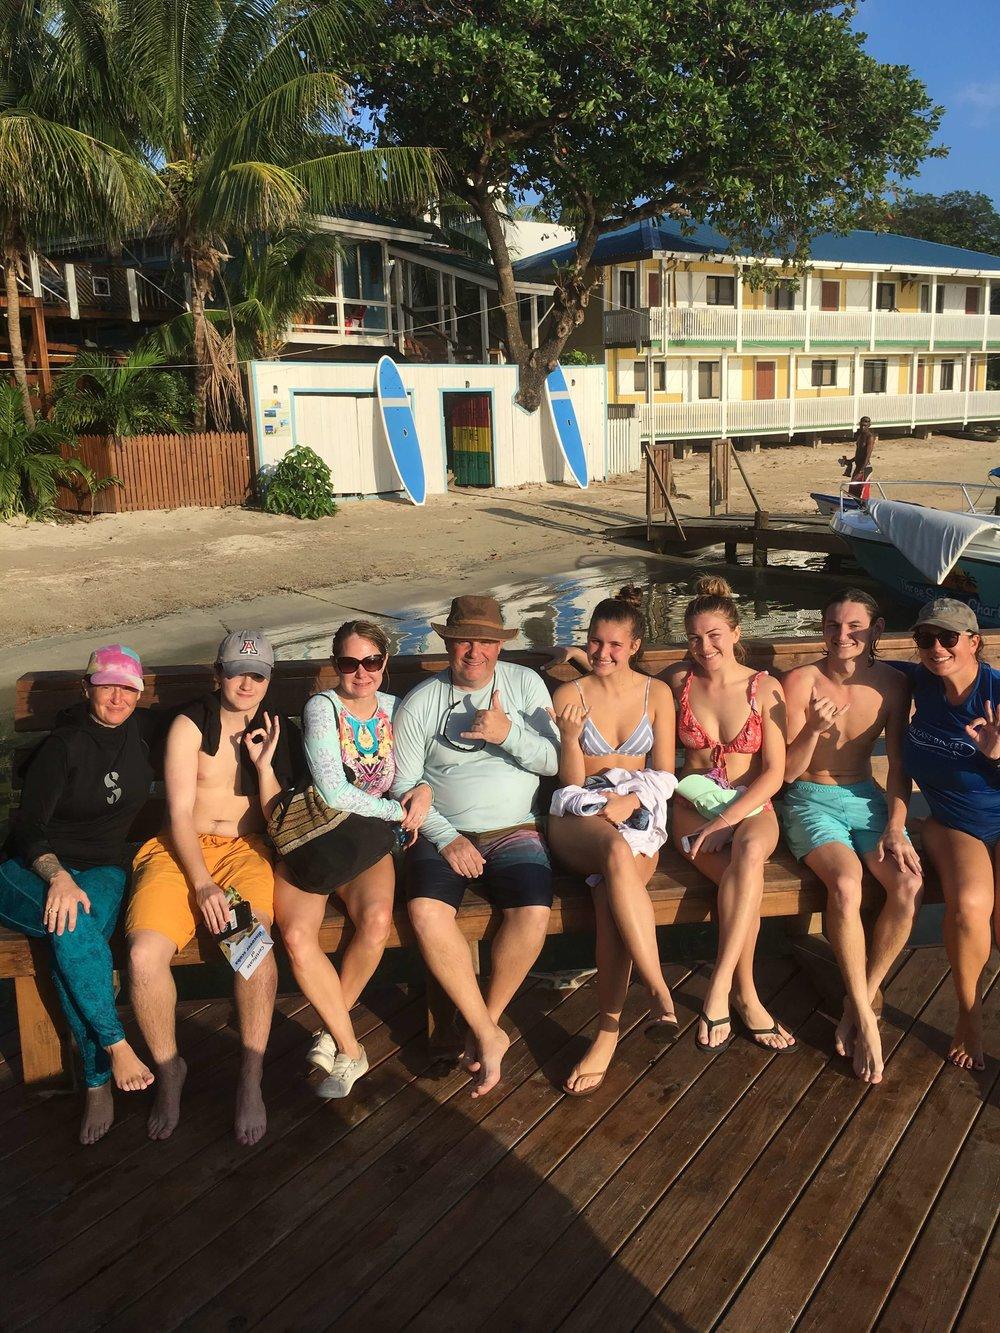 Robert, Michelle, Kristofer, Matthew, Isabelle, Danielle tried scuba diving!